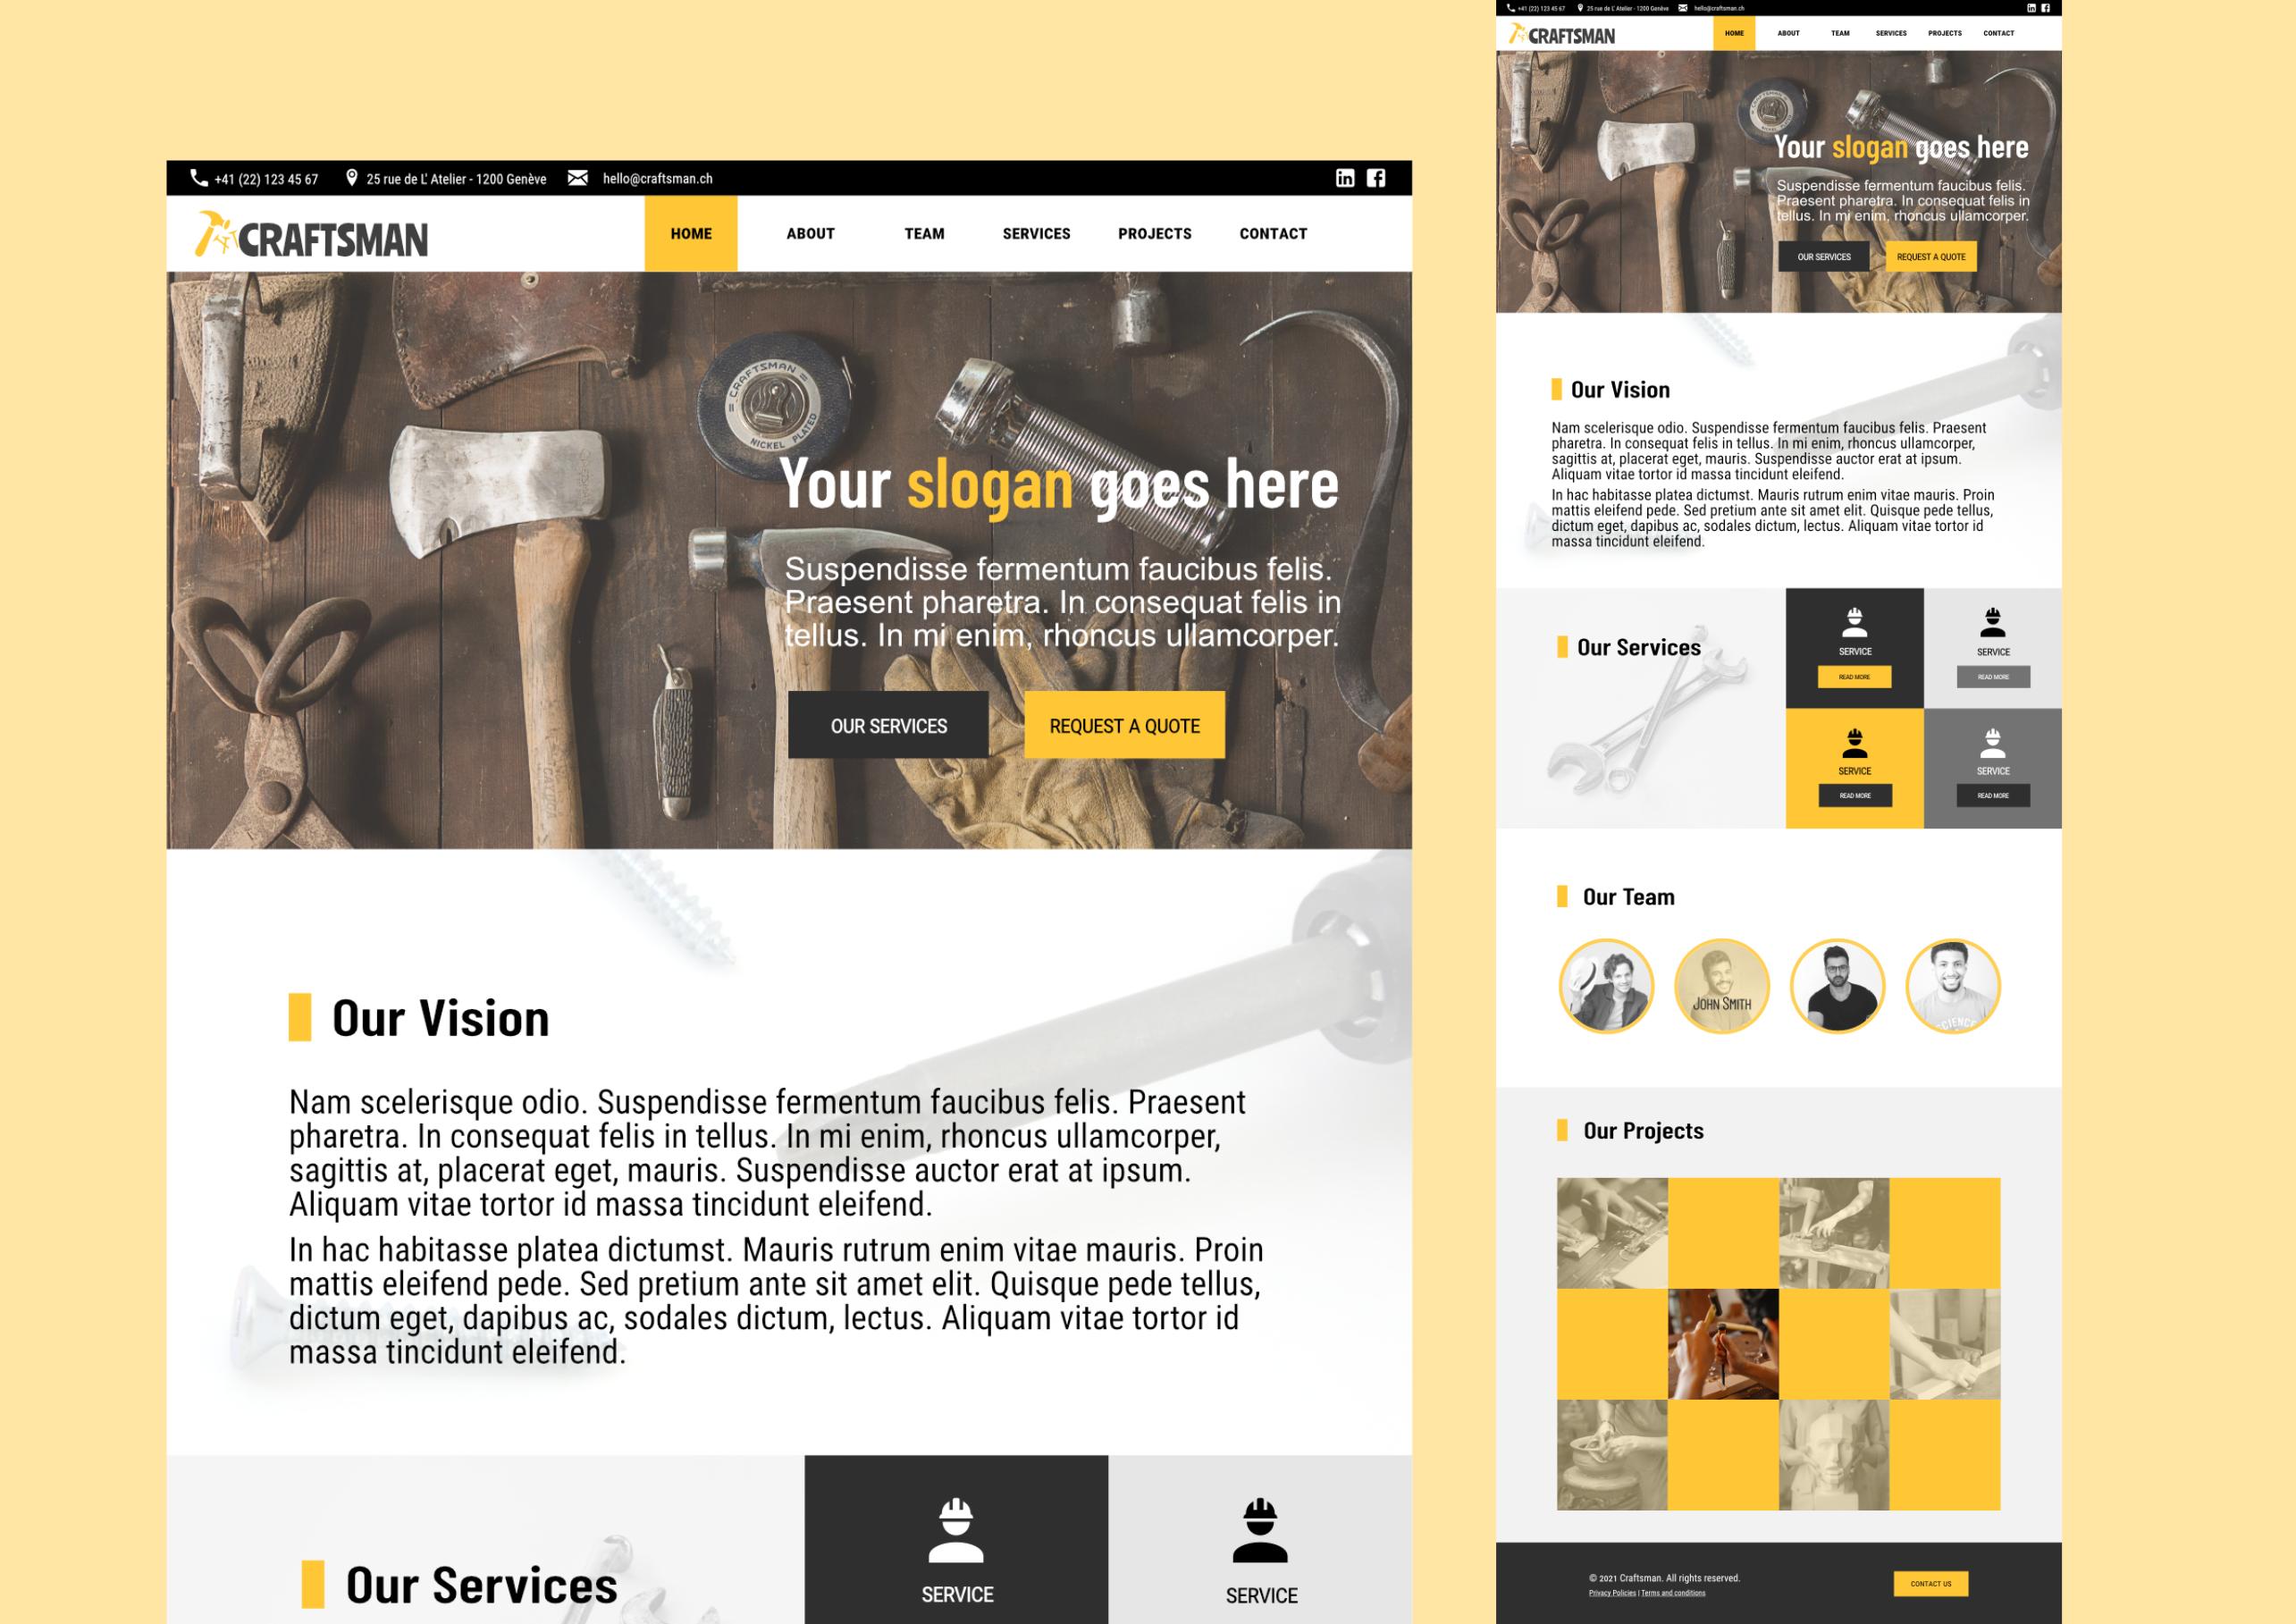 Craftman Services Conceptual Project